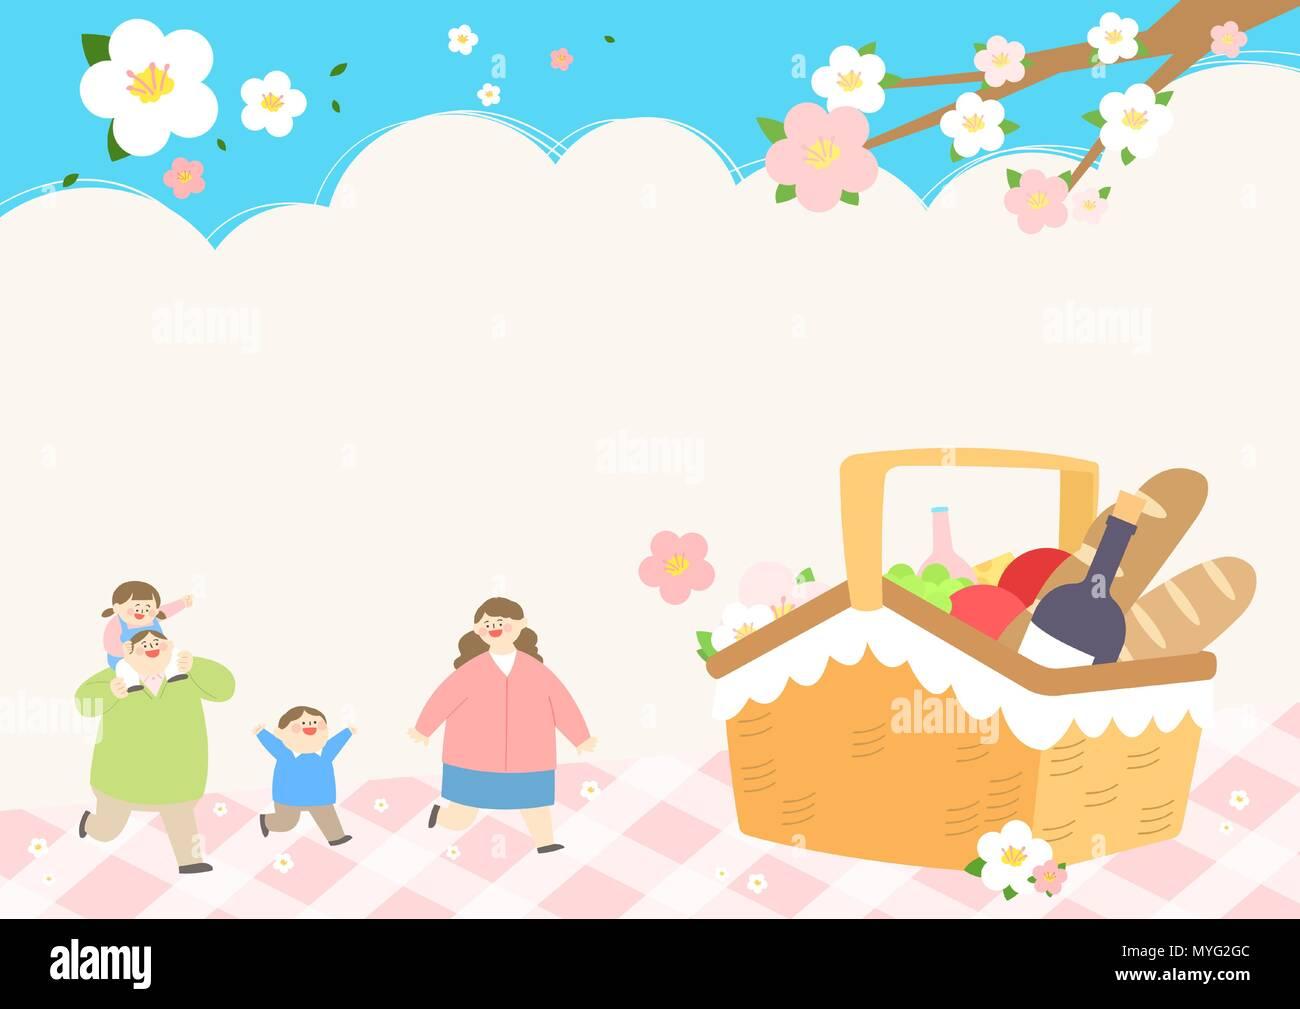 Vector - Welcome spring. Enjoy spring time illustration 001 - Stock Vector